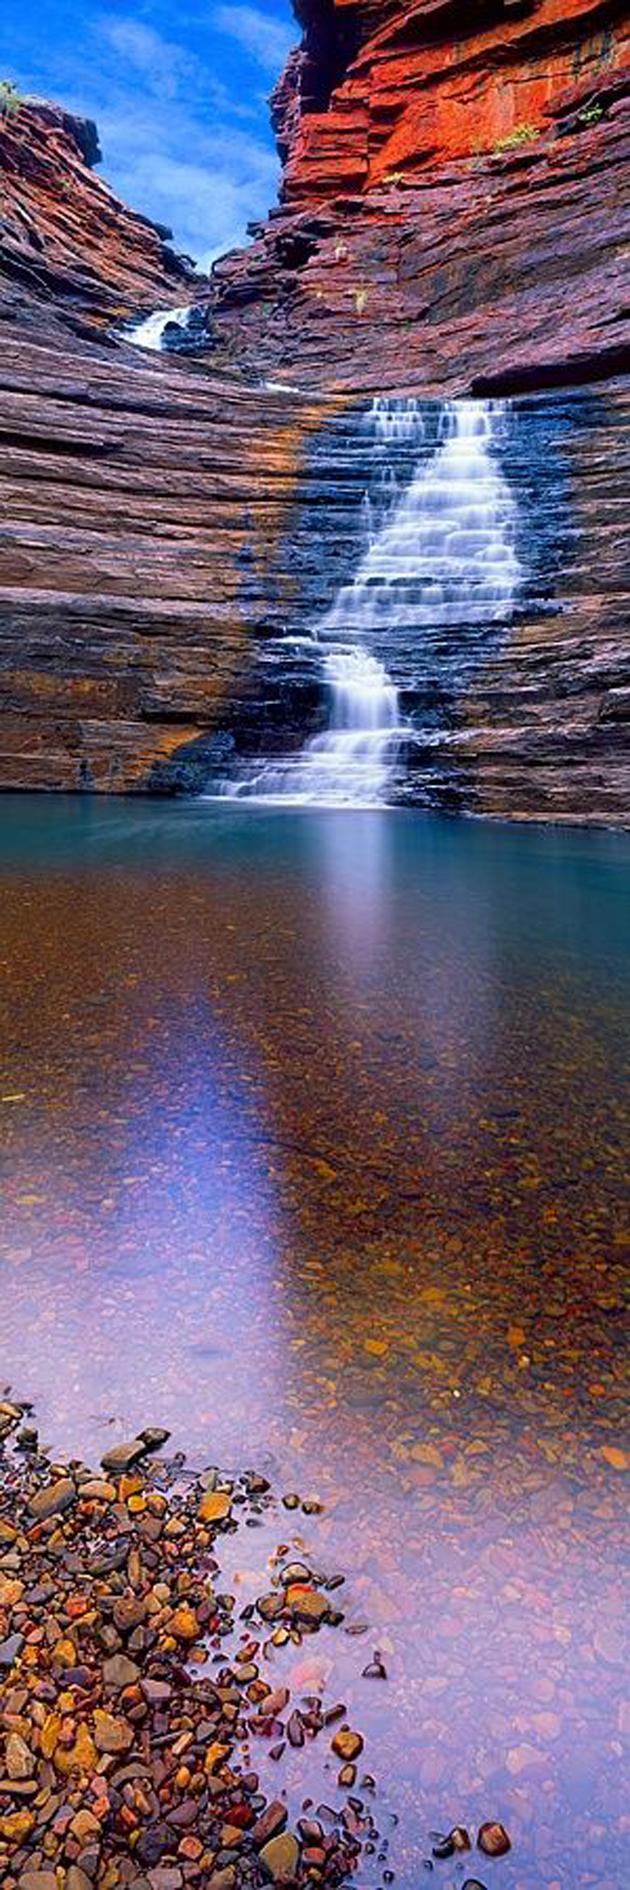 Joffrey Gorge, Karijini National Park, Australia by Christian Fletcher